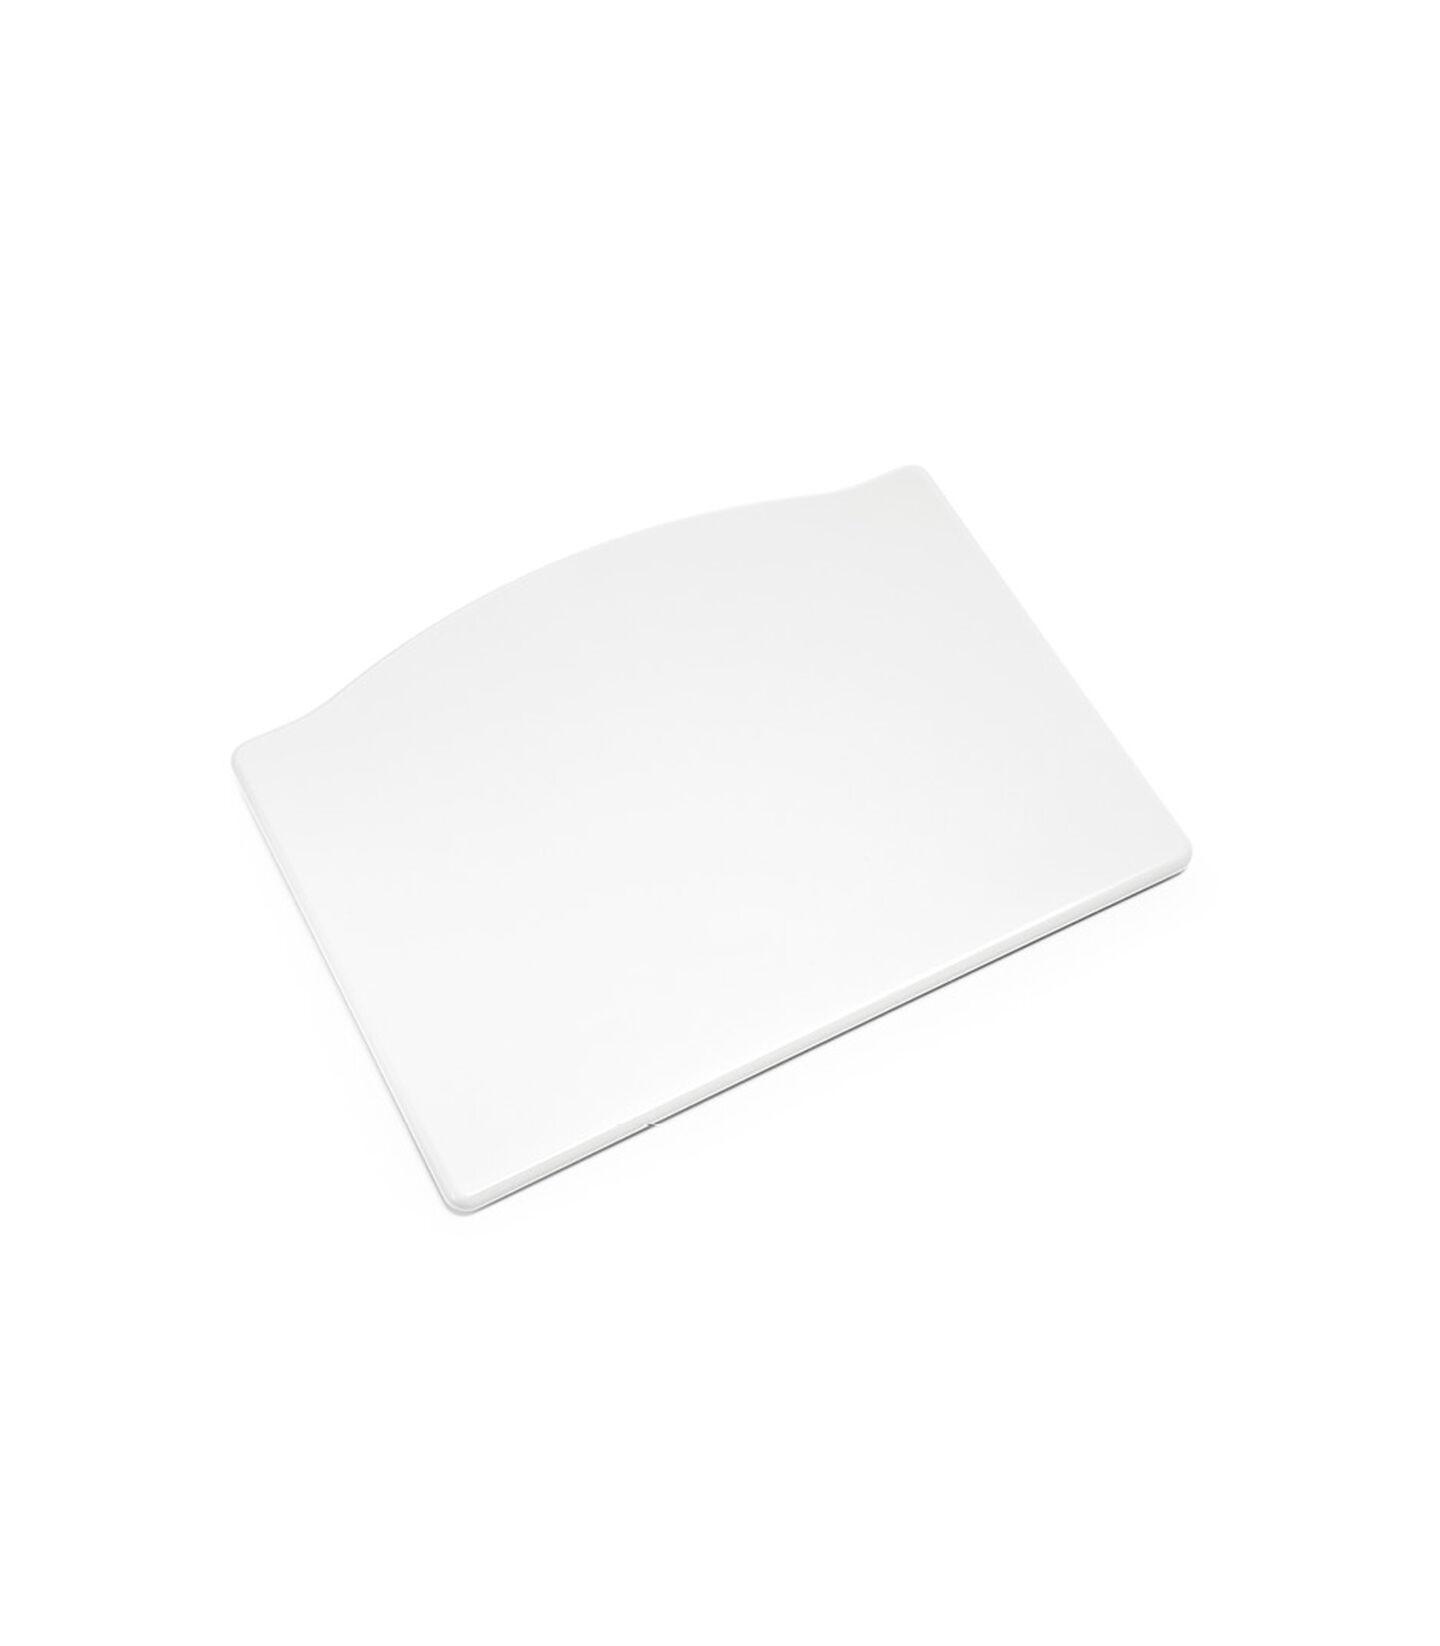 Tripp Trapp® Footplate White, White, mainview